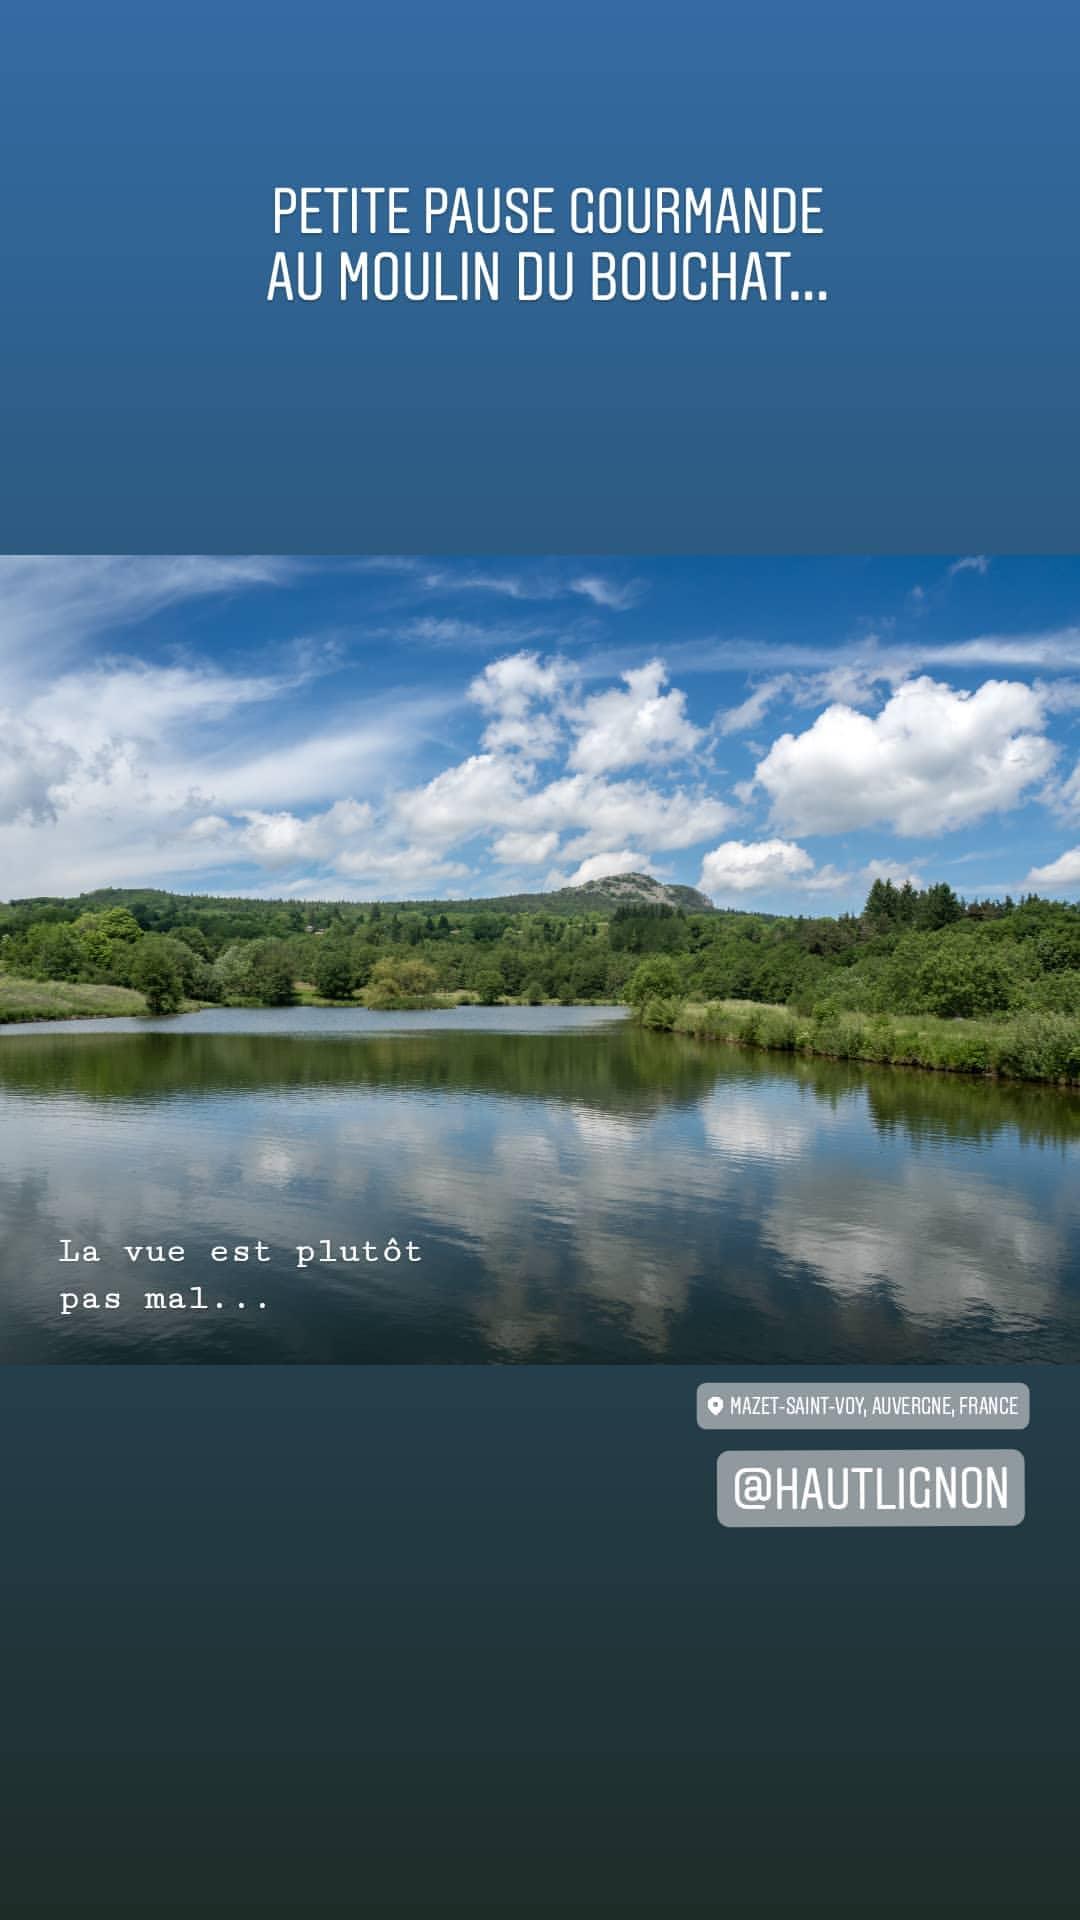 Instagram Haue-Loire bonjour Marcel